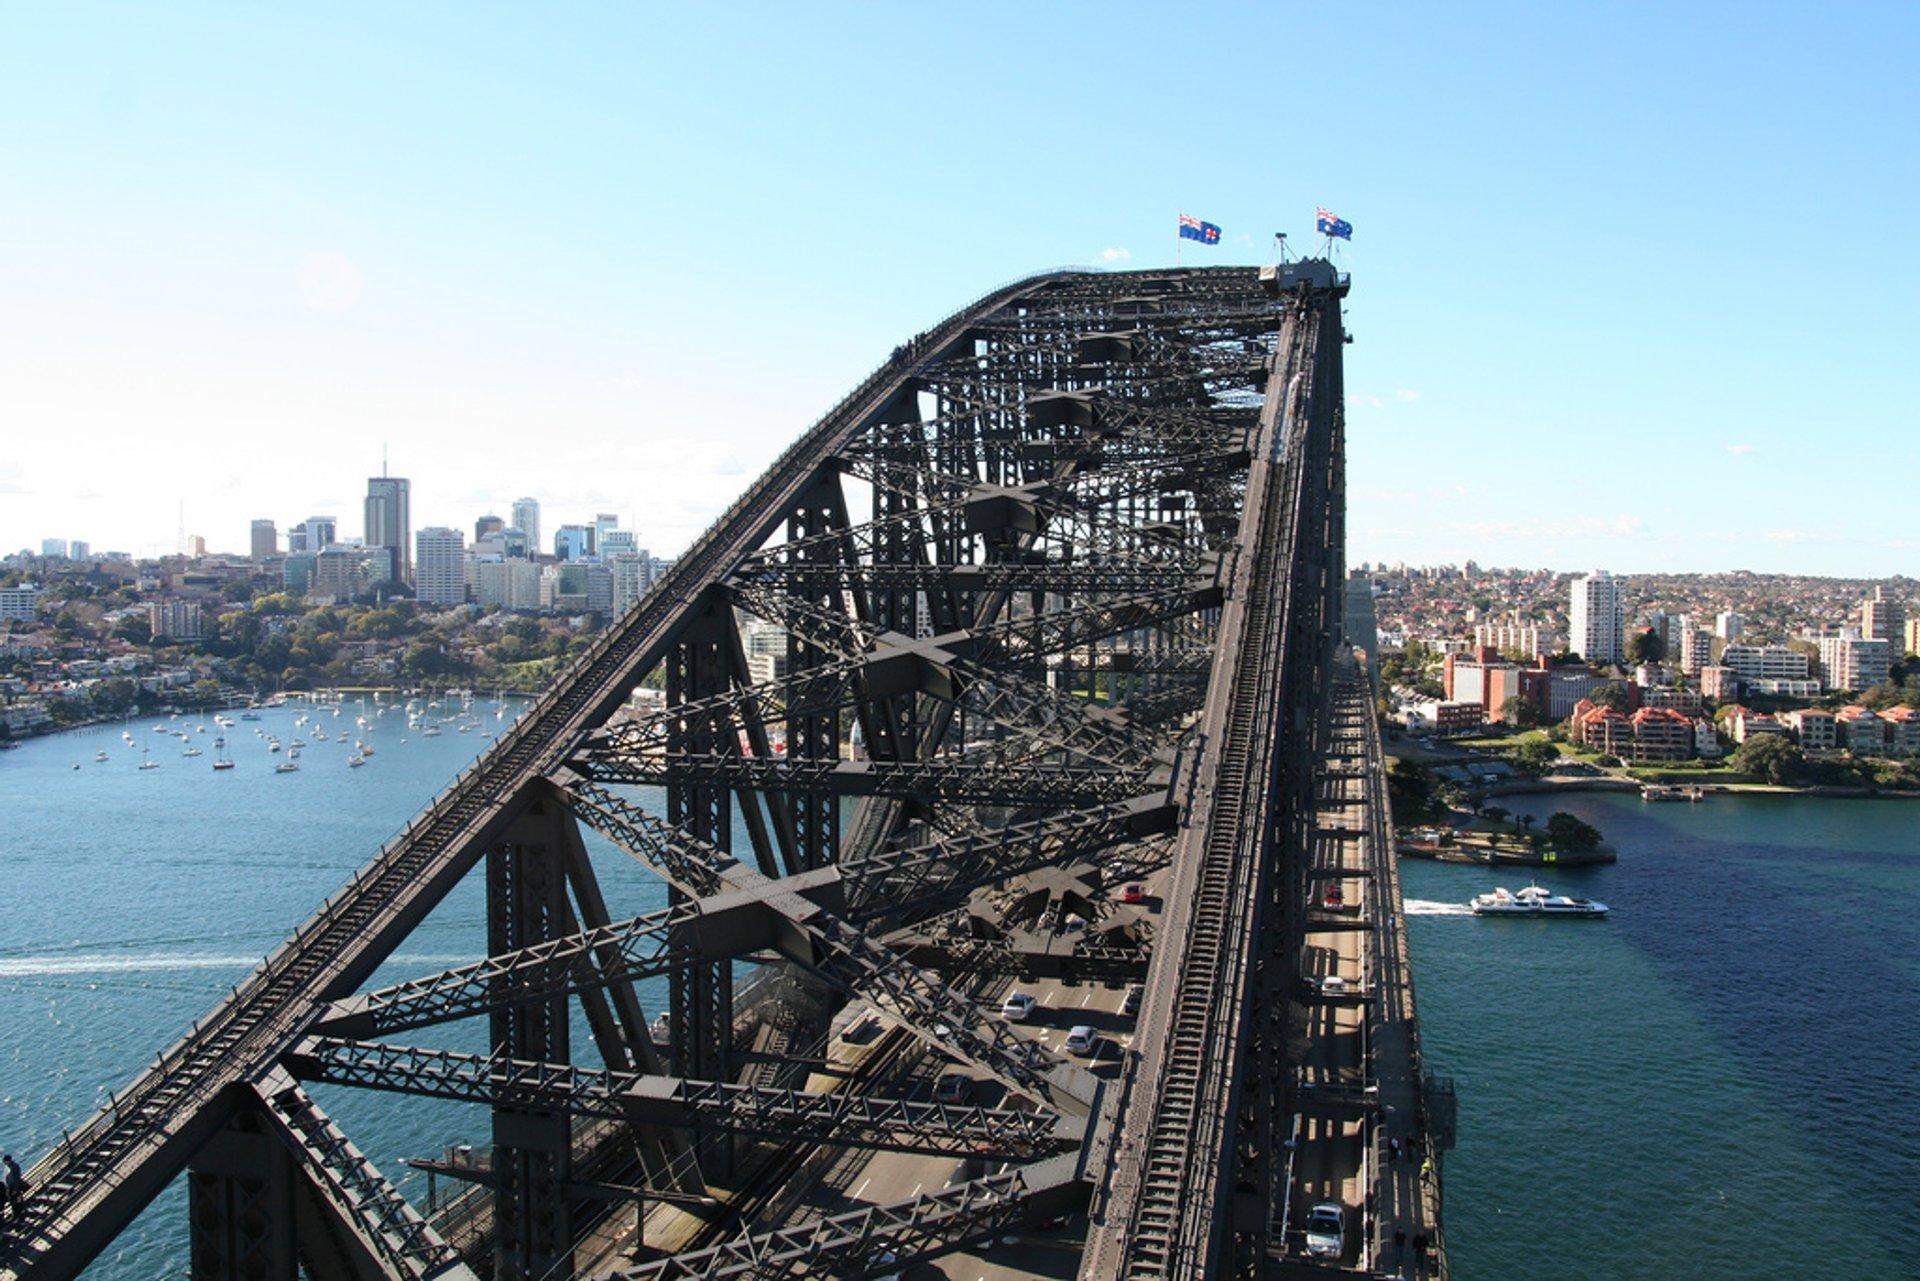 Sydney Harbour Bridge Climb in Sydney 2019 - Best Time